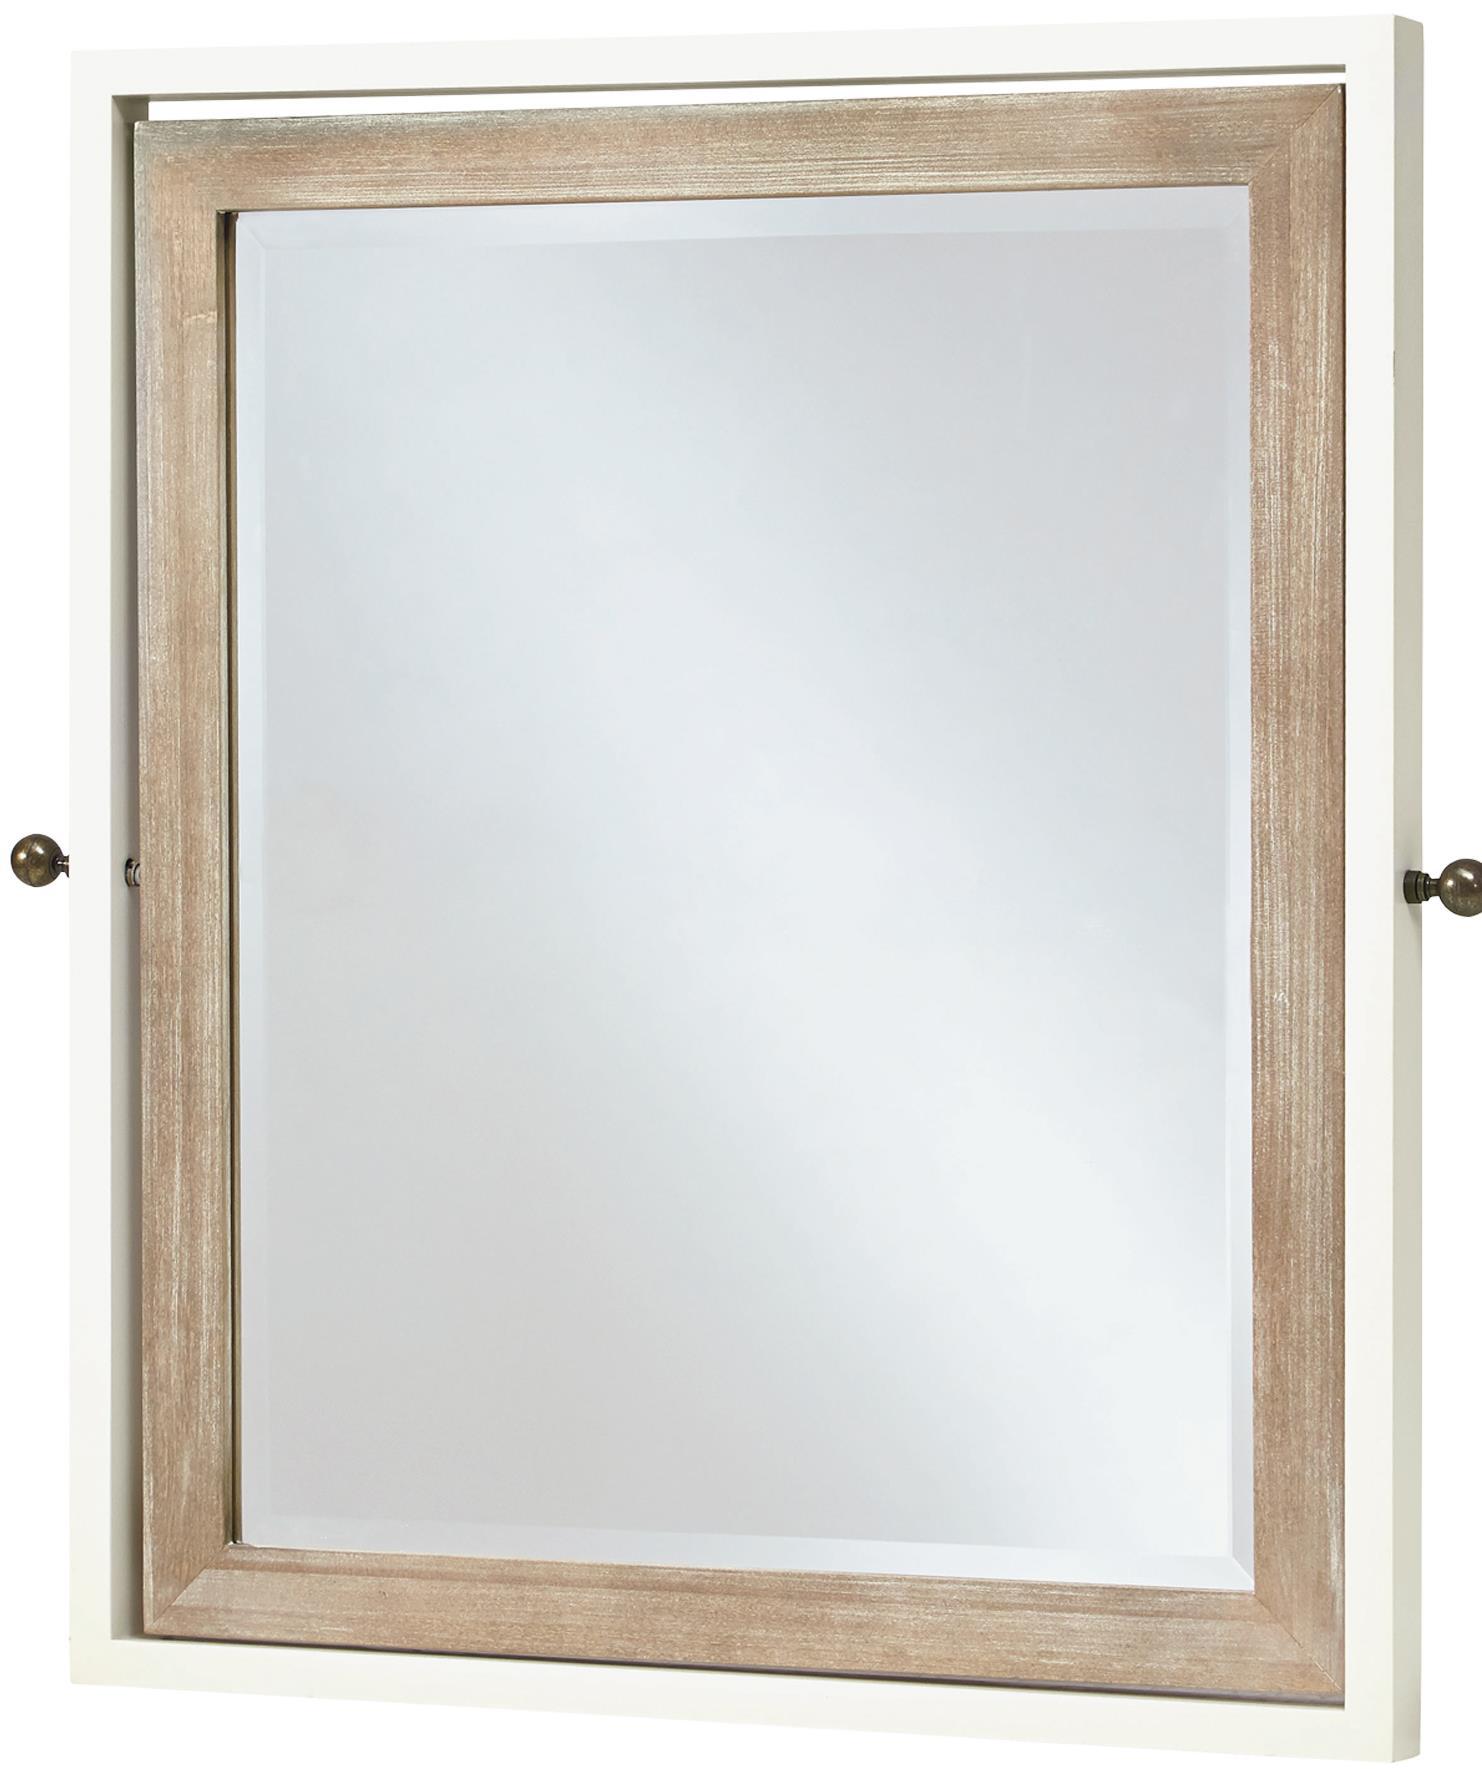 #myRoom Tilt Mirror by Smartstuff at HomeWorld Furniture